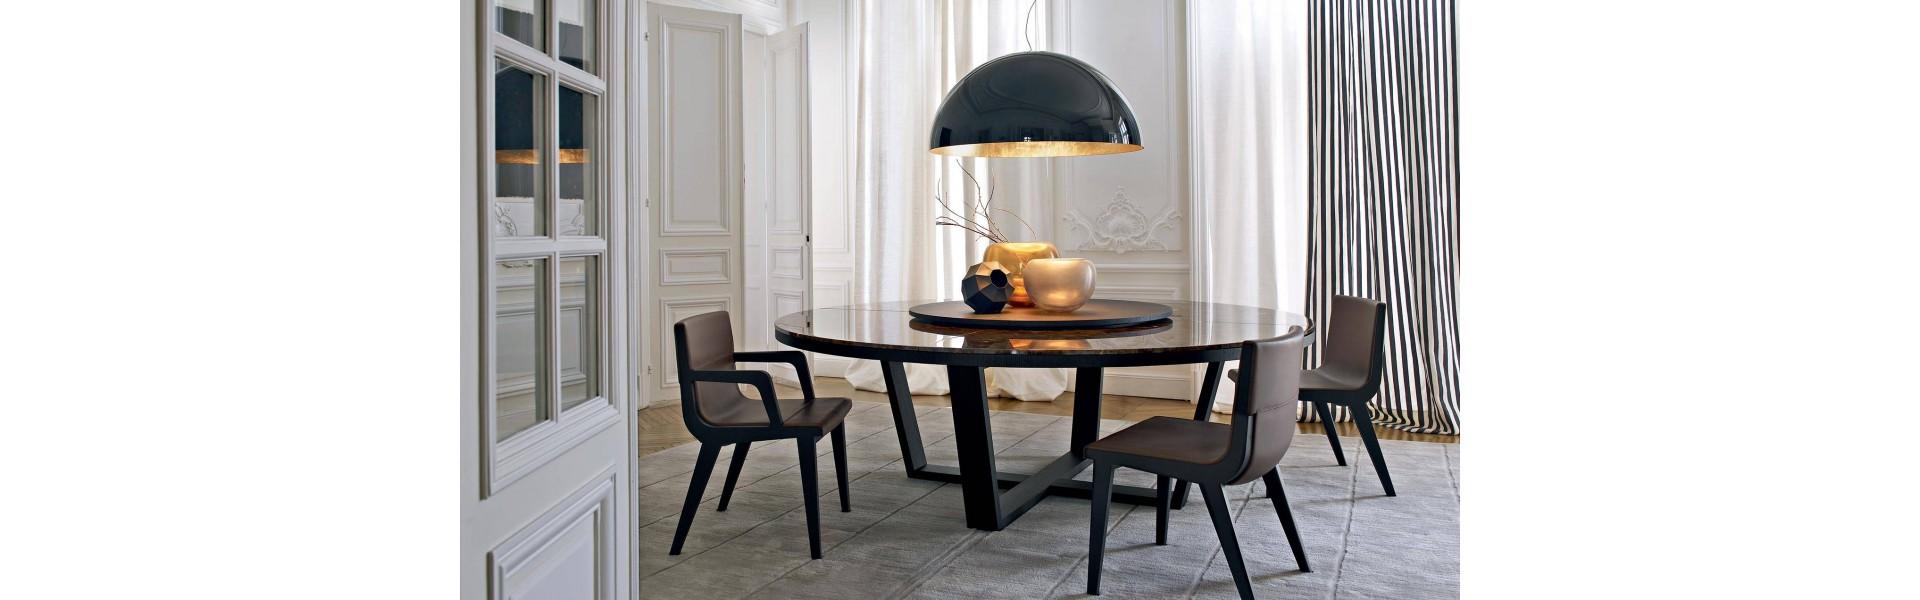 Столы как опора дома